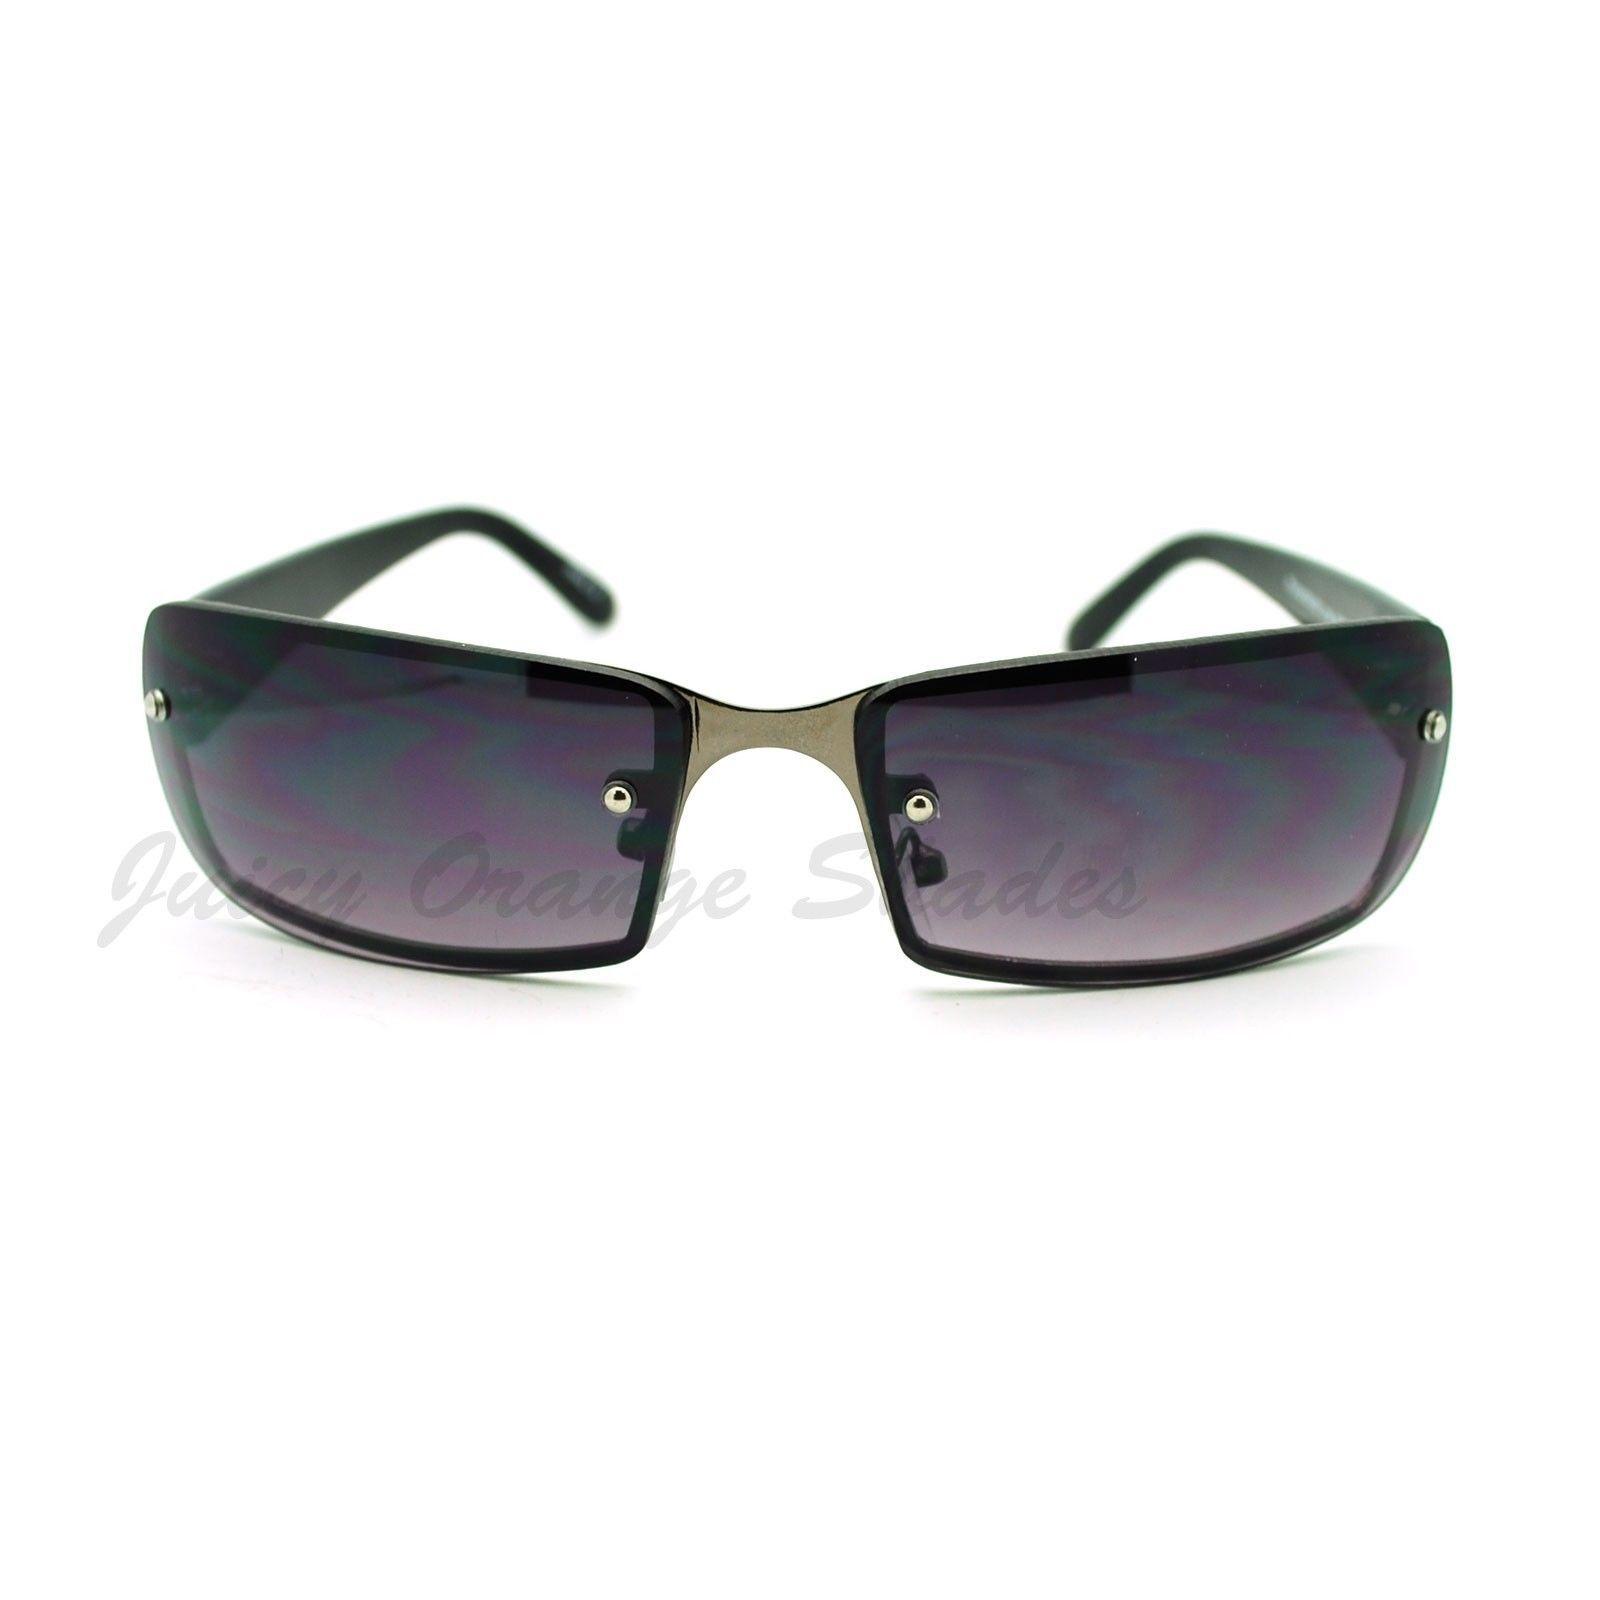 Small Narrow Rectangular Rimless Fashion Unisex Sunglasses